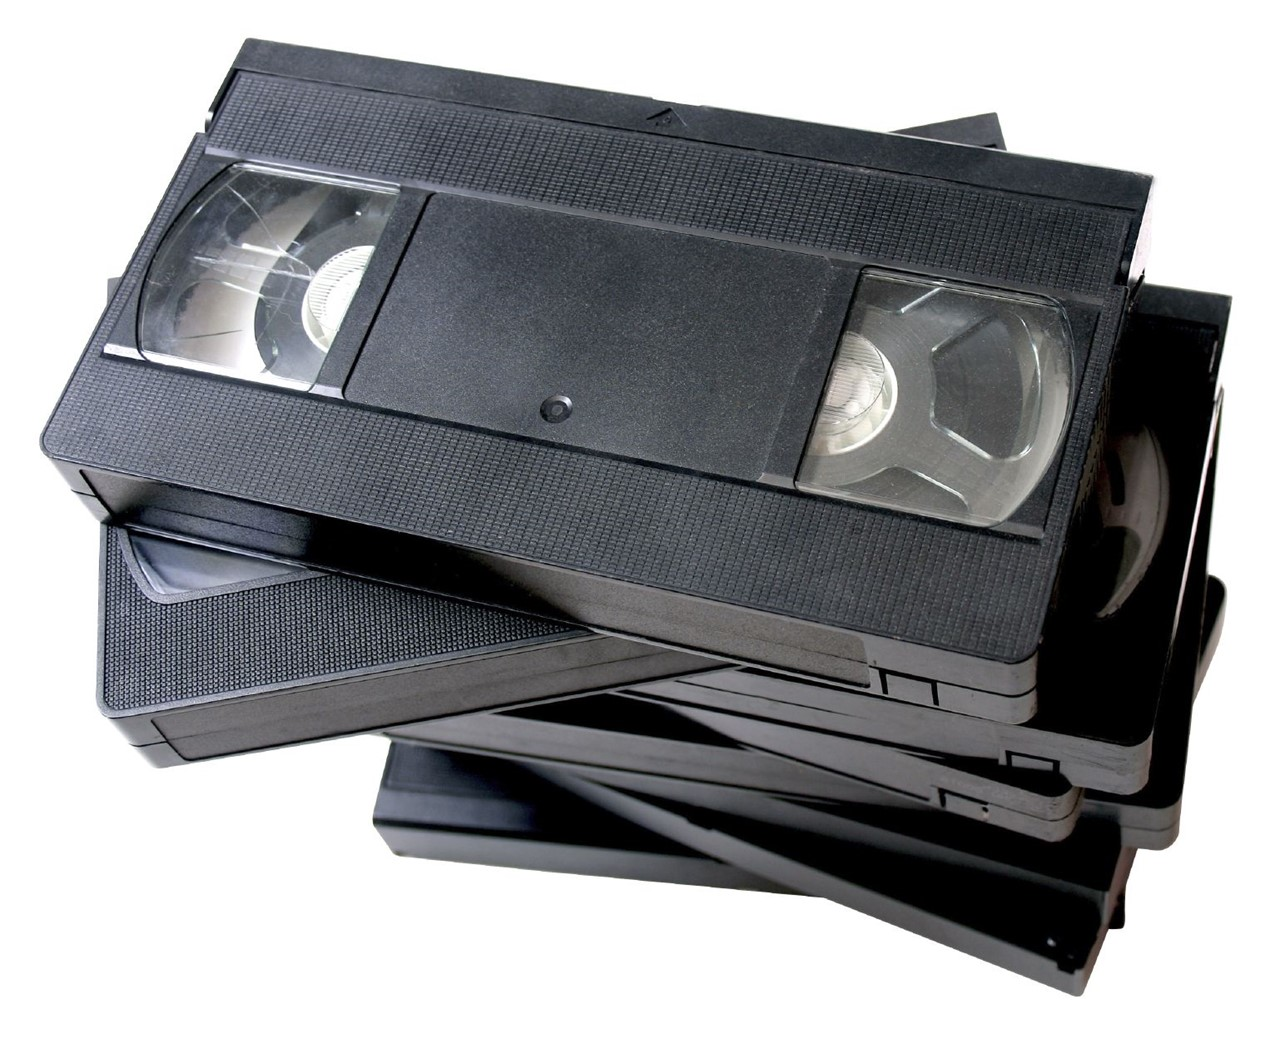 vhs kassette auf dvd kopieren cd drucker dicom cd. Black Bedroom Furniture Sets. Home Design Ideas